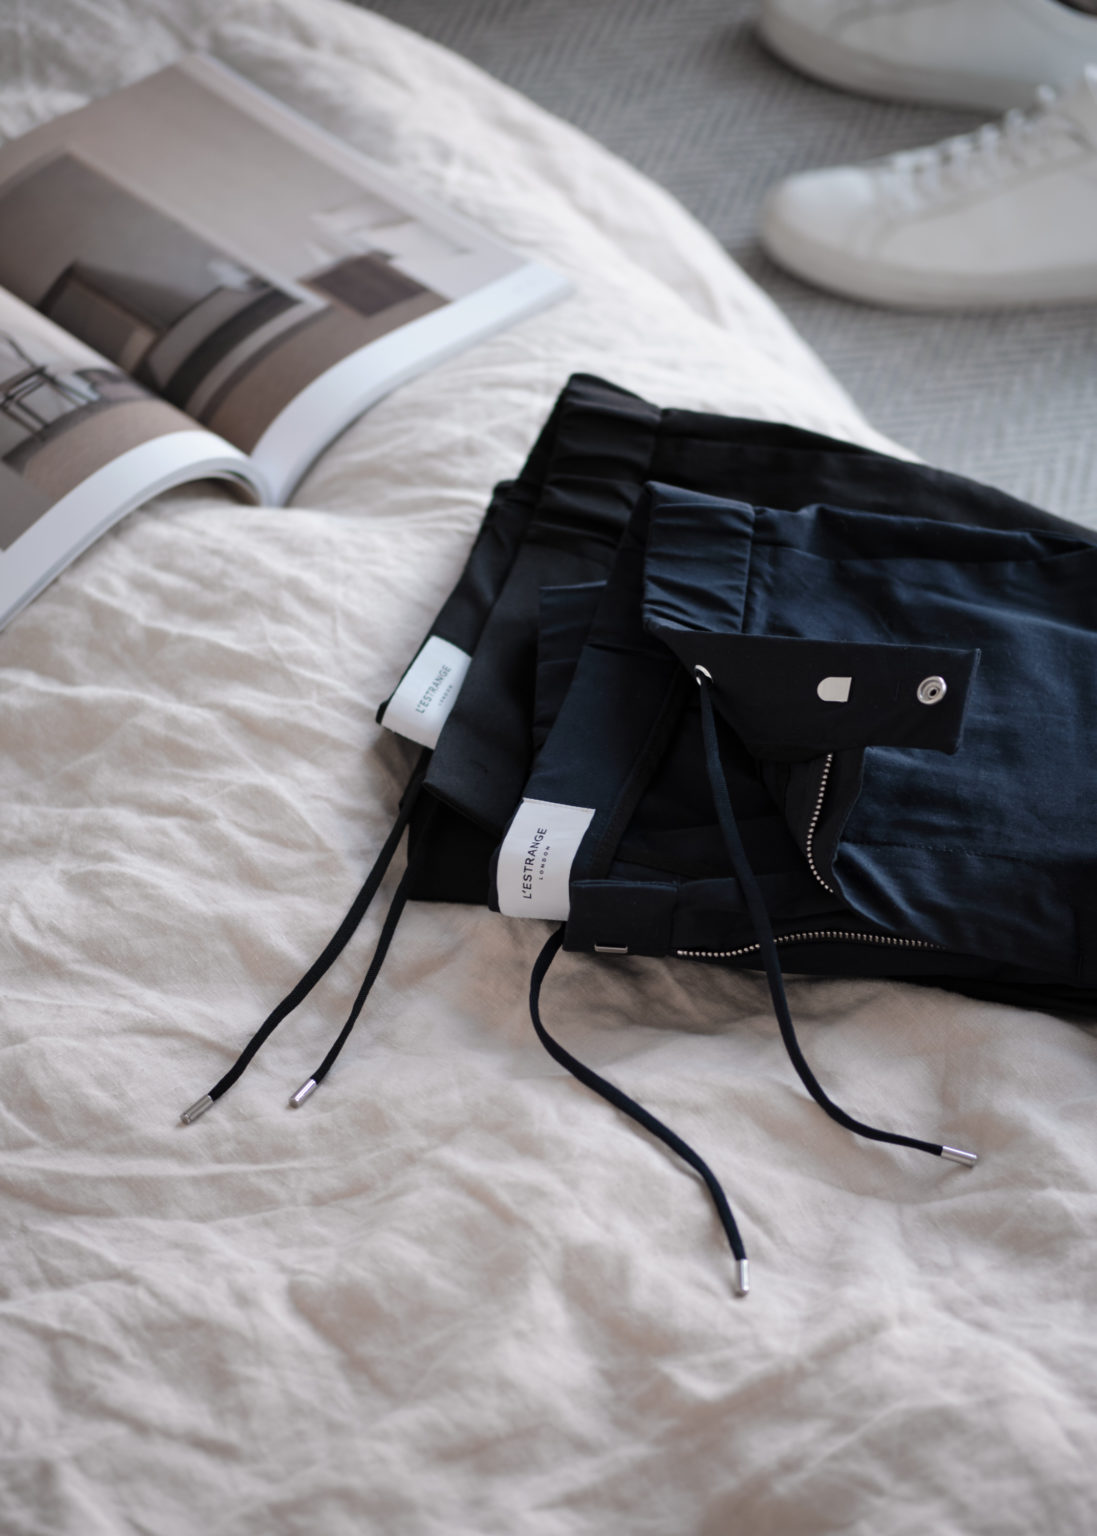 L'Estrange 24 Trouser Review - Softer Volumes